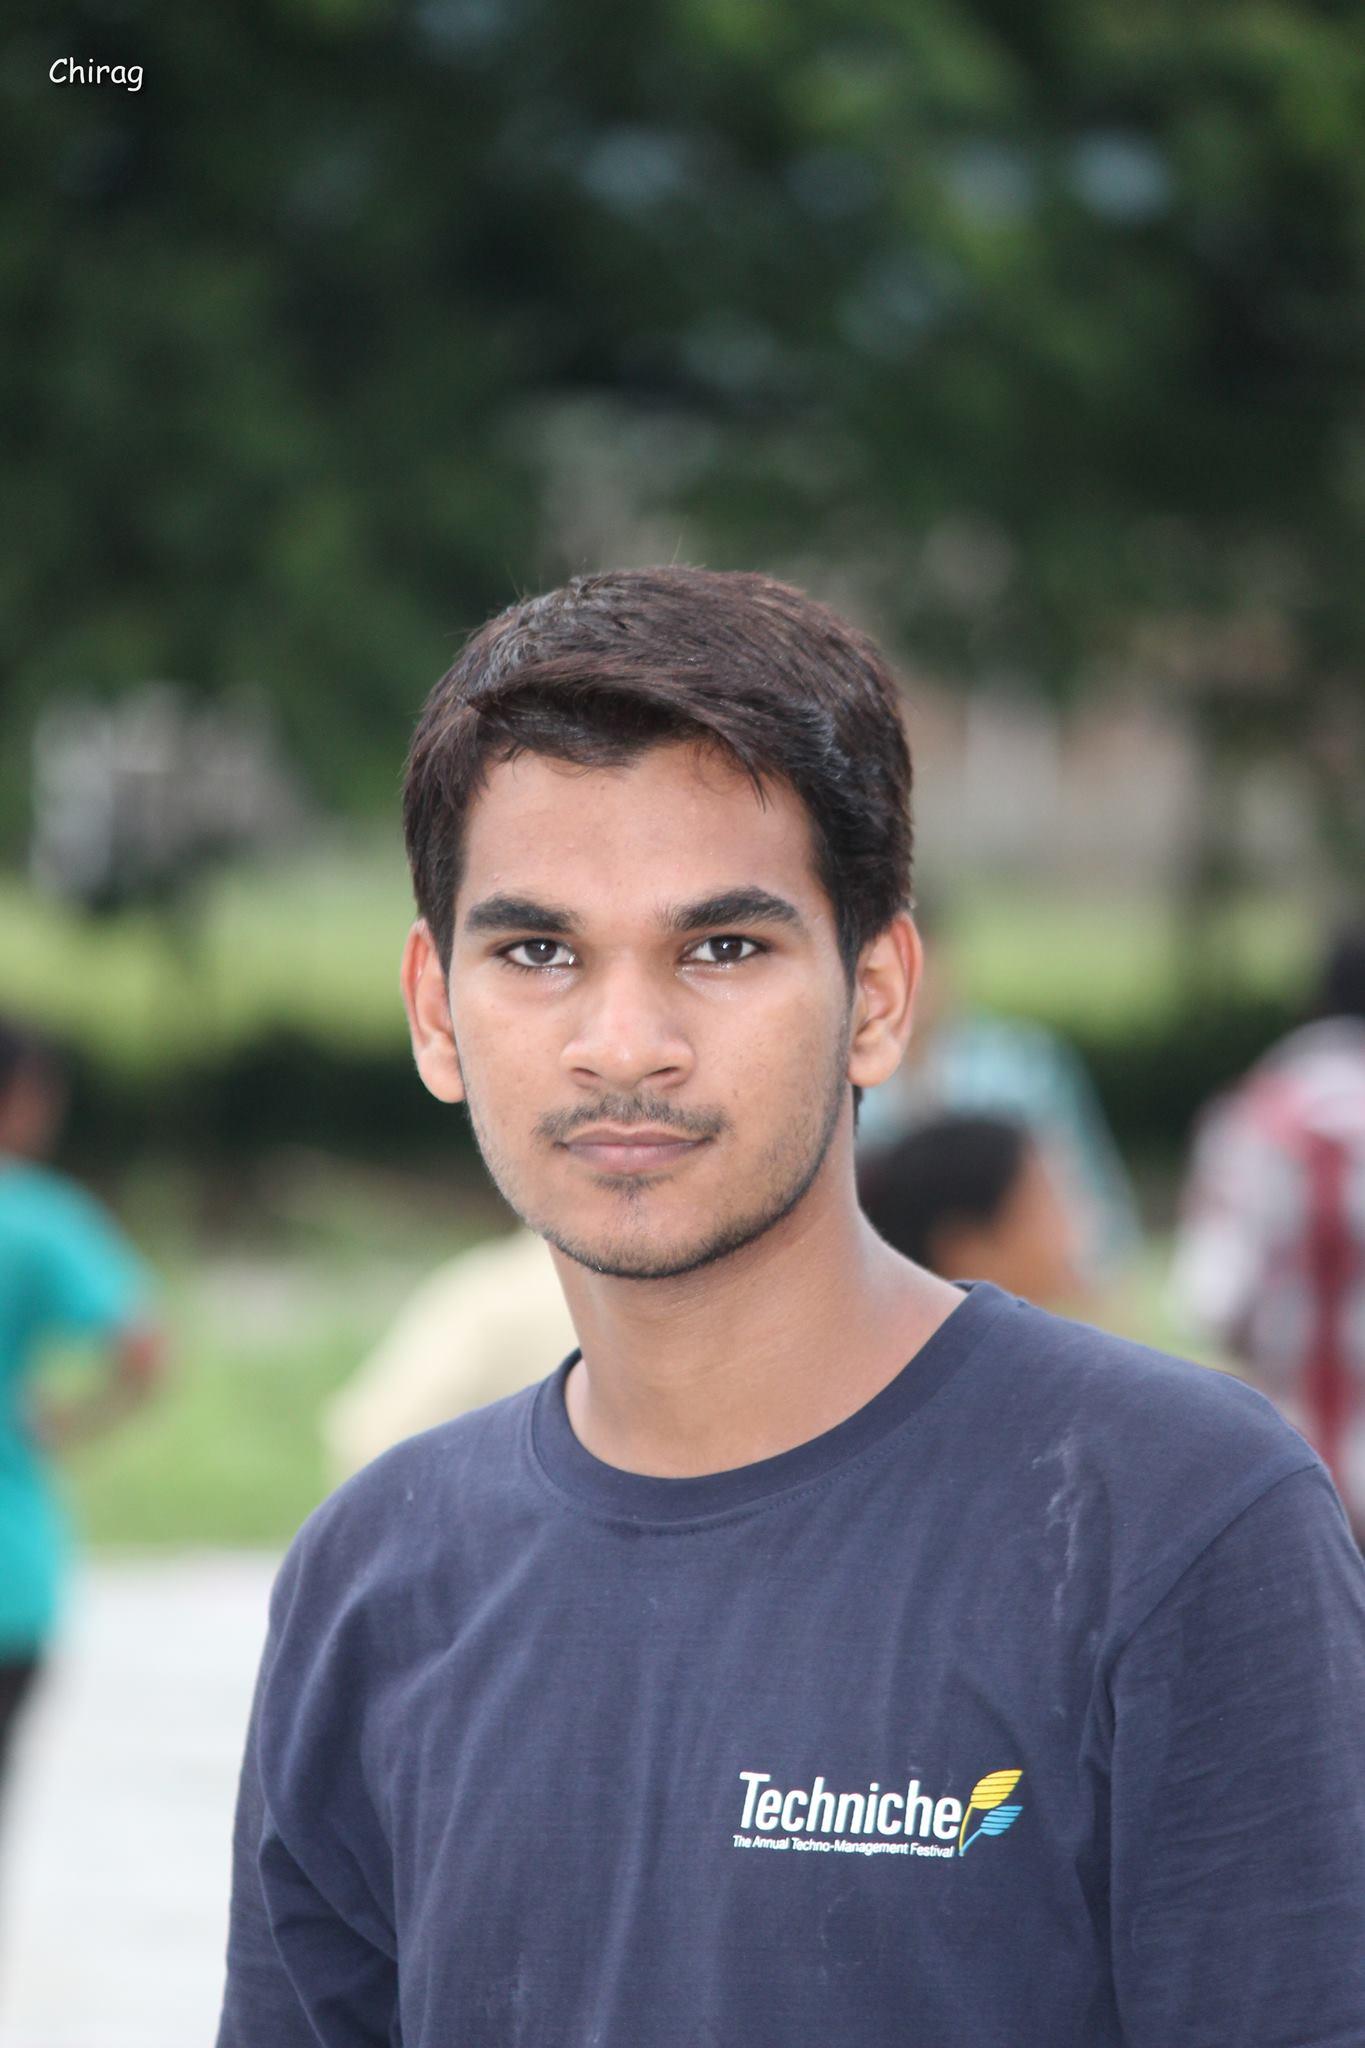 Mr Saurabh Kumar Ahirwar